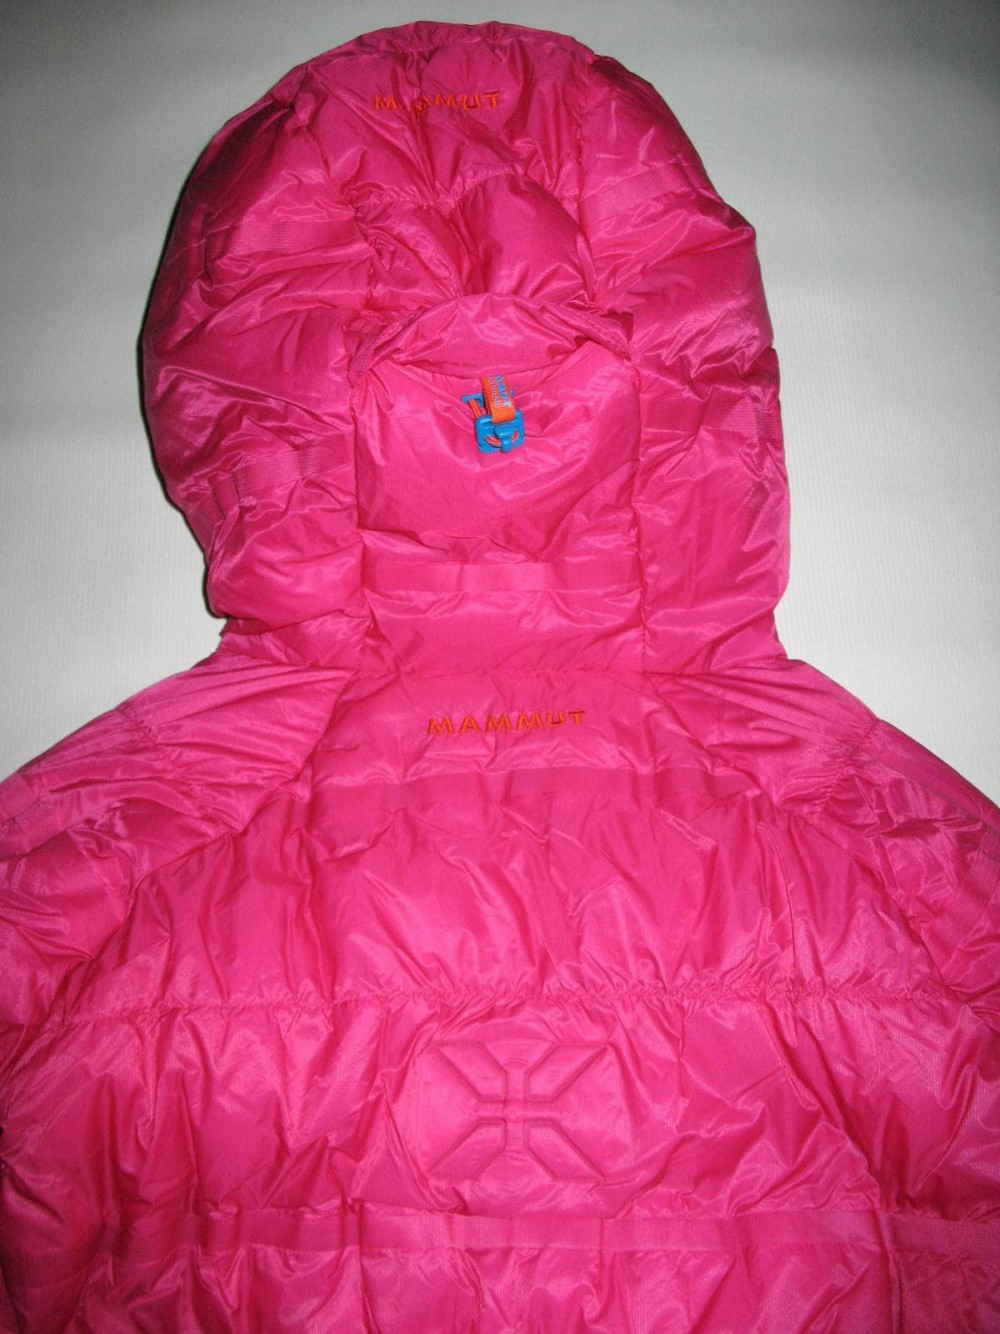 Куртка MAMMUT biwak eiger extreme jacket lady (размер S/M),3200 грн - 9